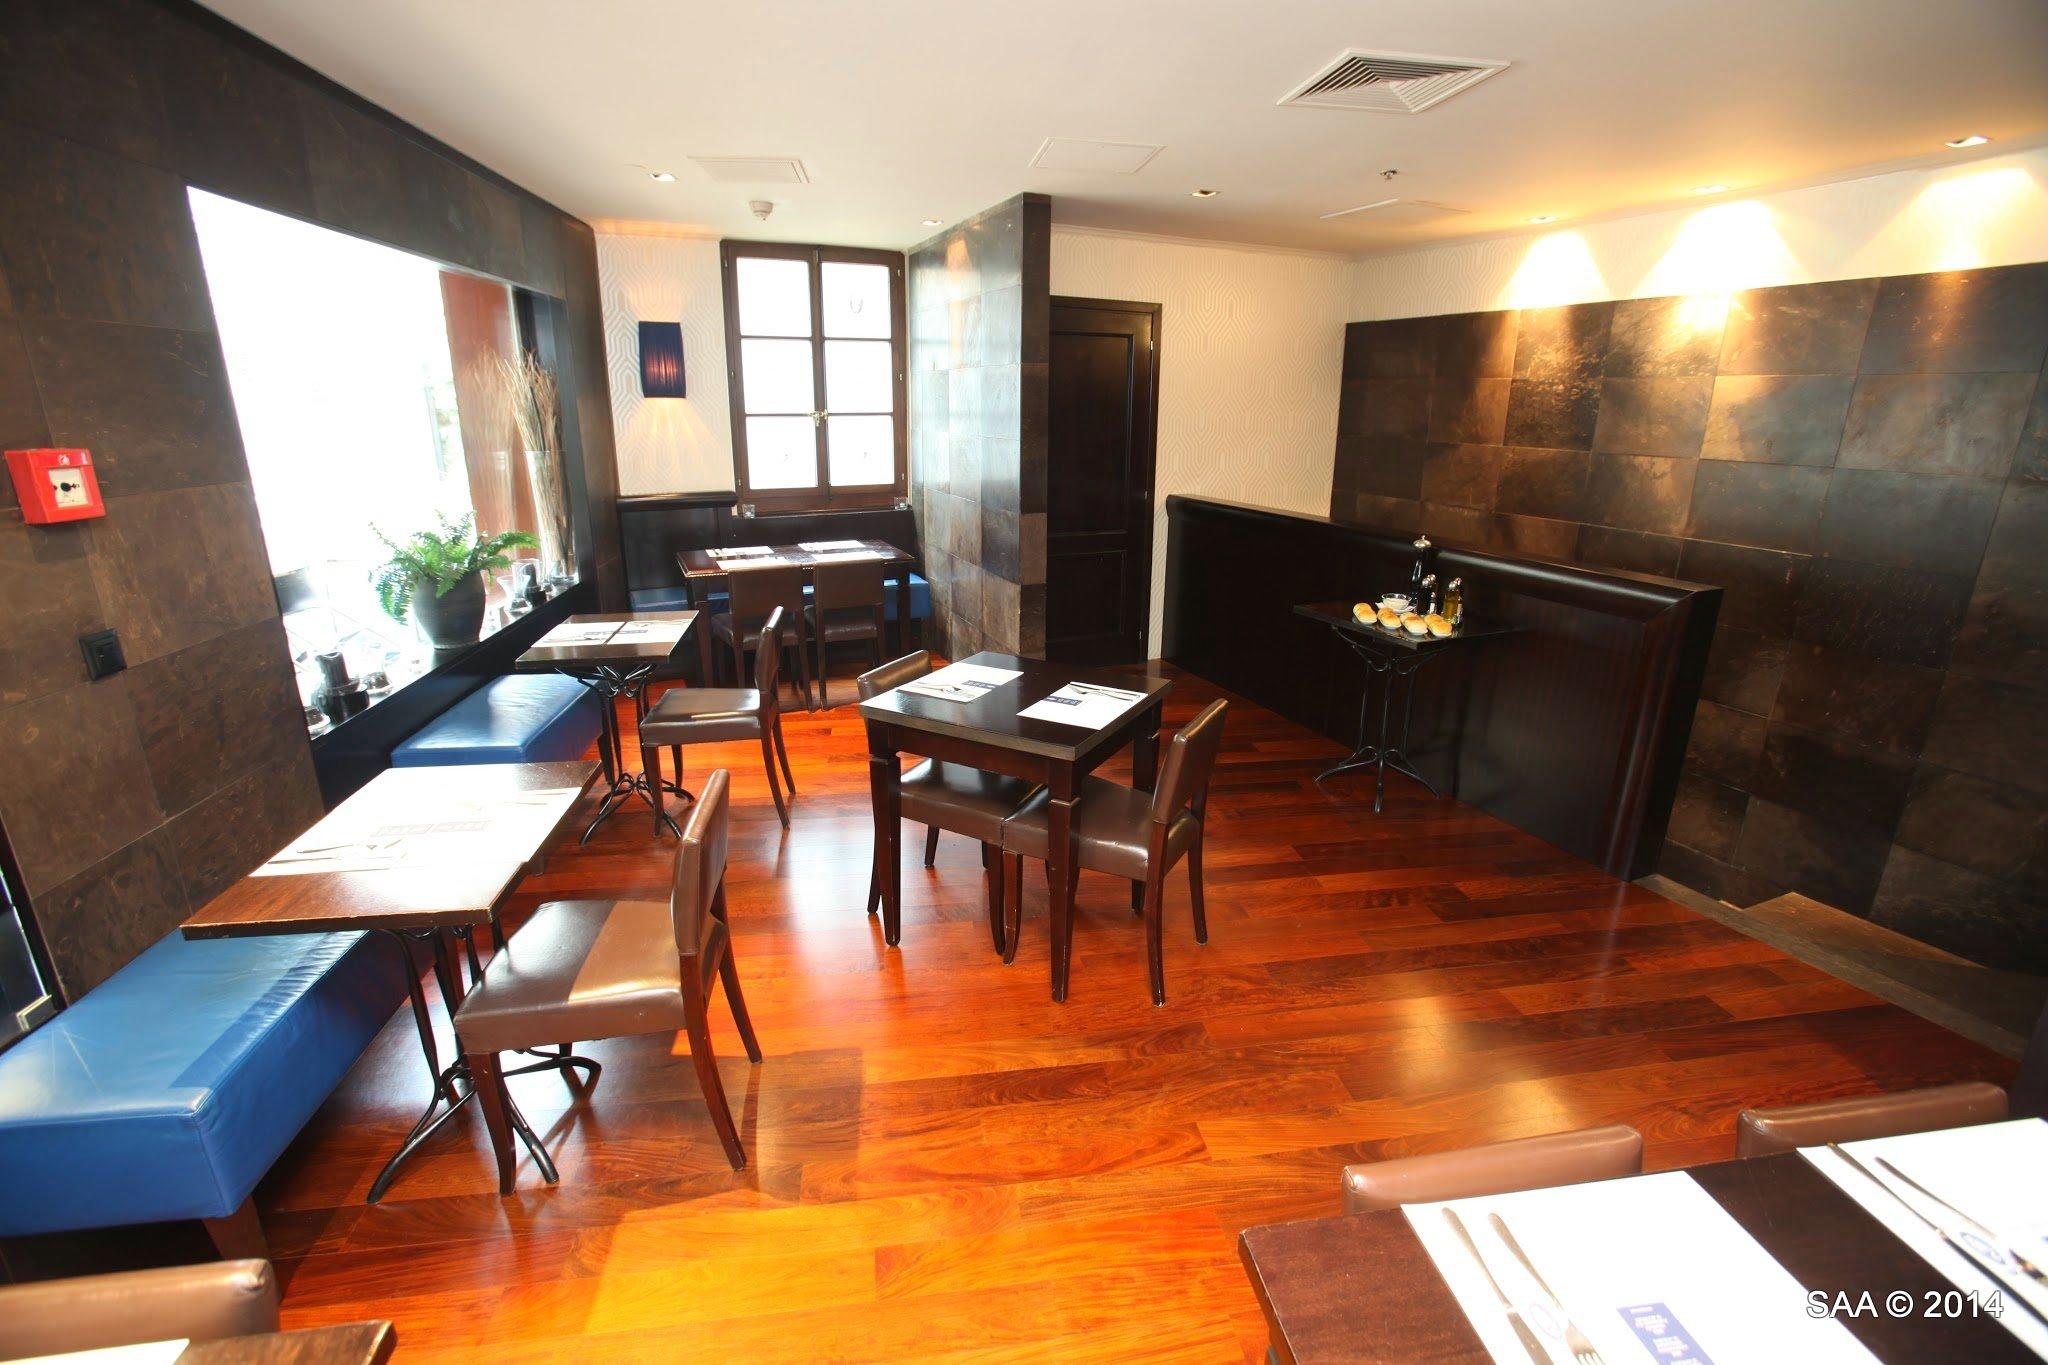 Bar_Lounge_Capocaccia_Ginevra-003.jpg